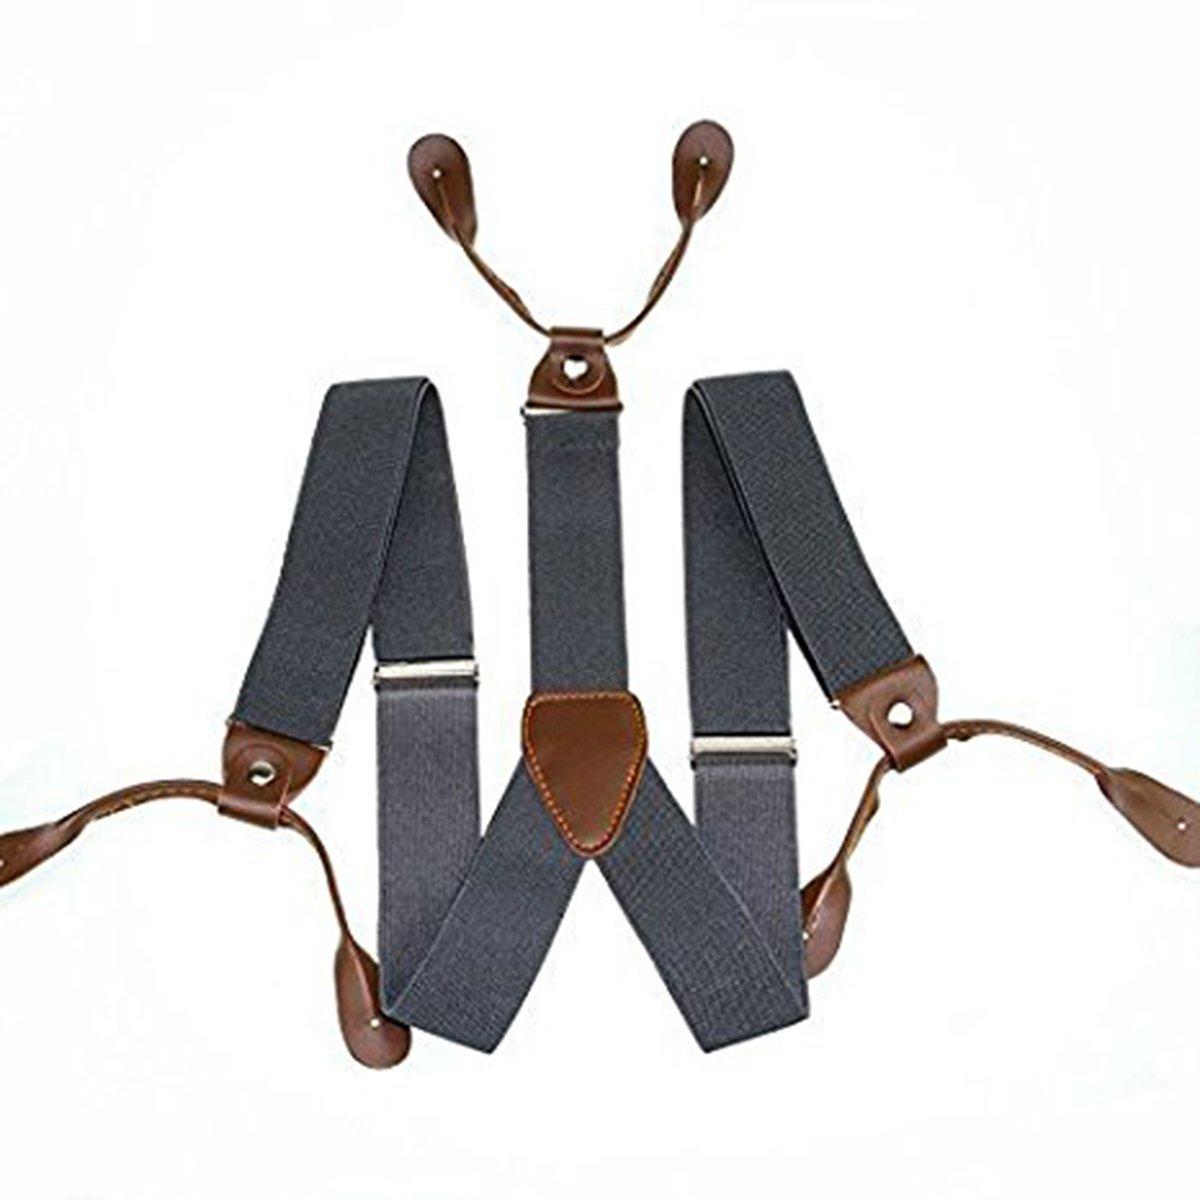 Kids Braces Lycra Spandex Button Hole Y Shaped Back Adjustable Elasticated Braces Suspenders 25mm